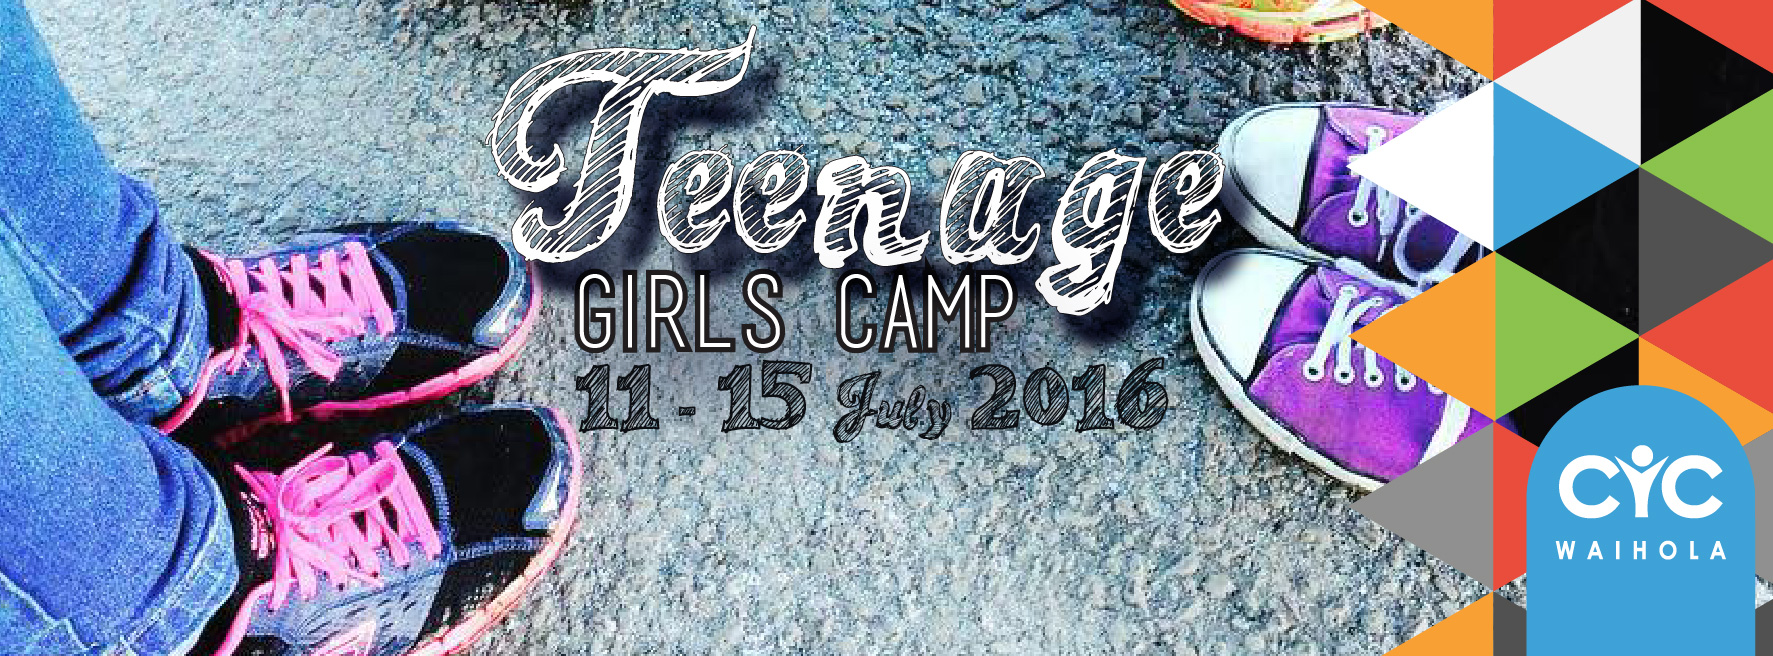 2016-Teenage-girl-cover-01